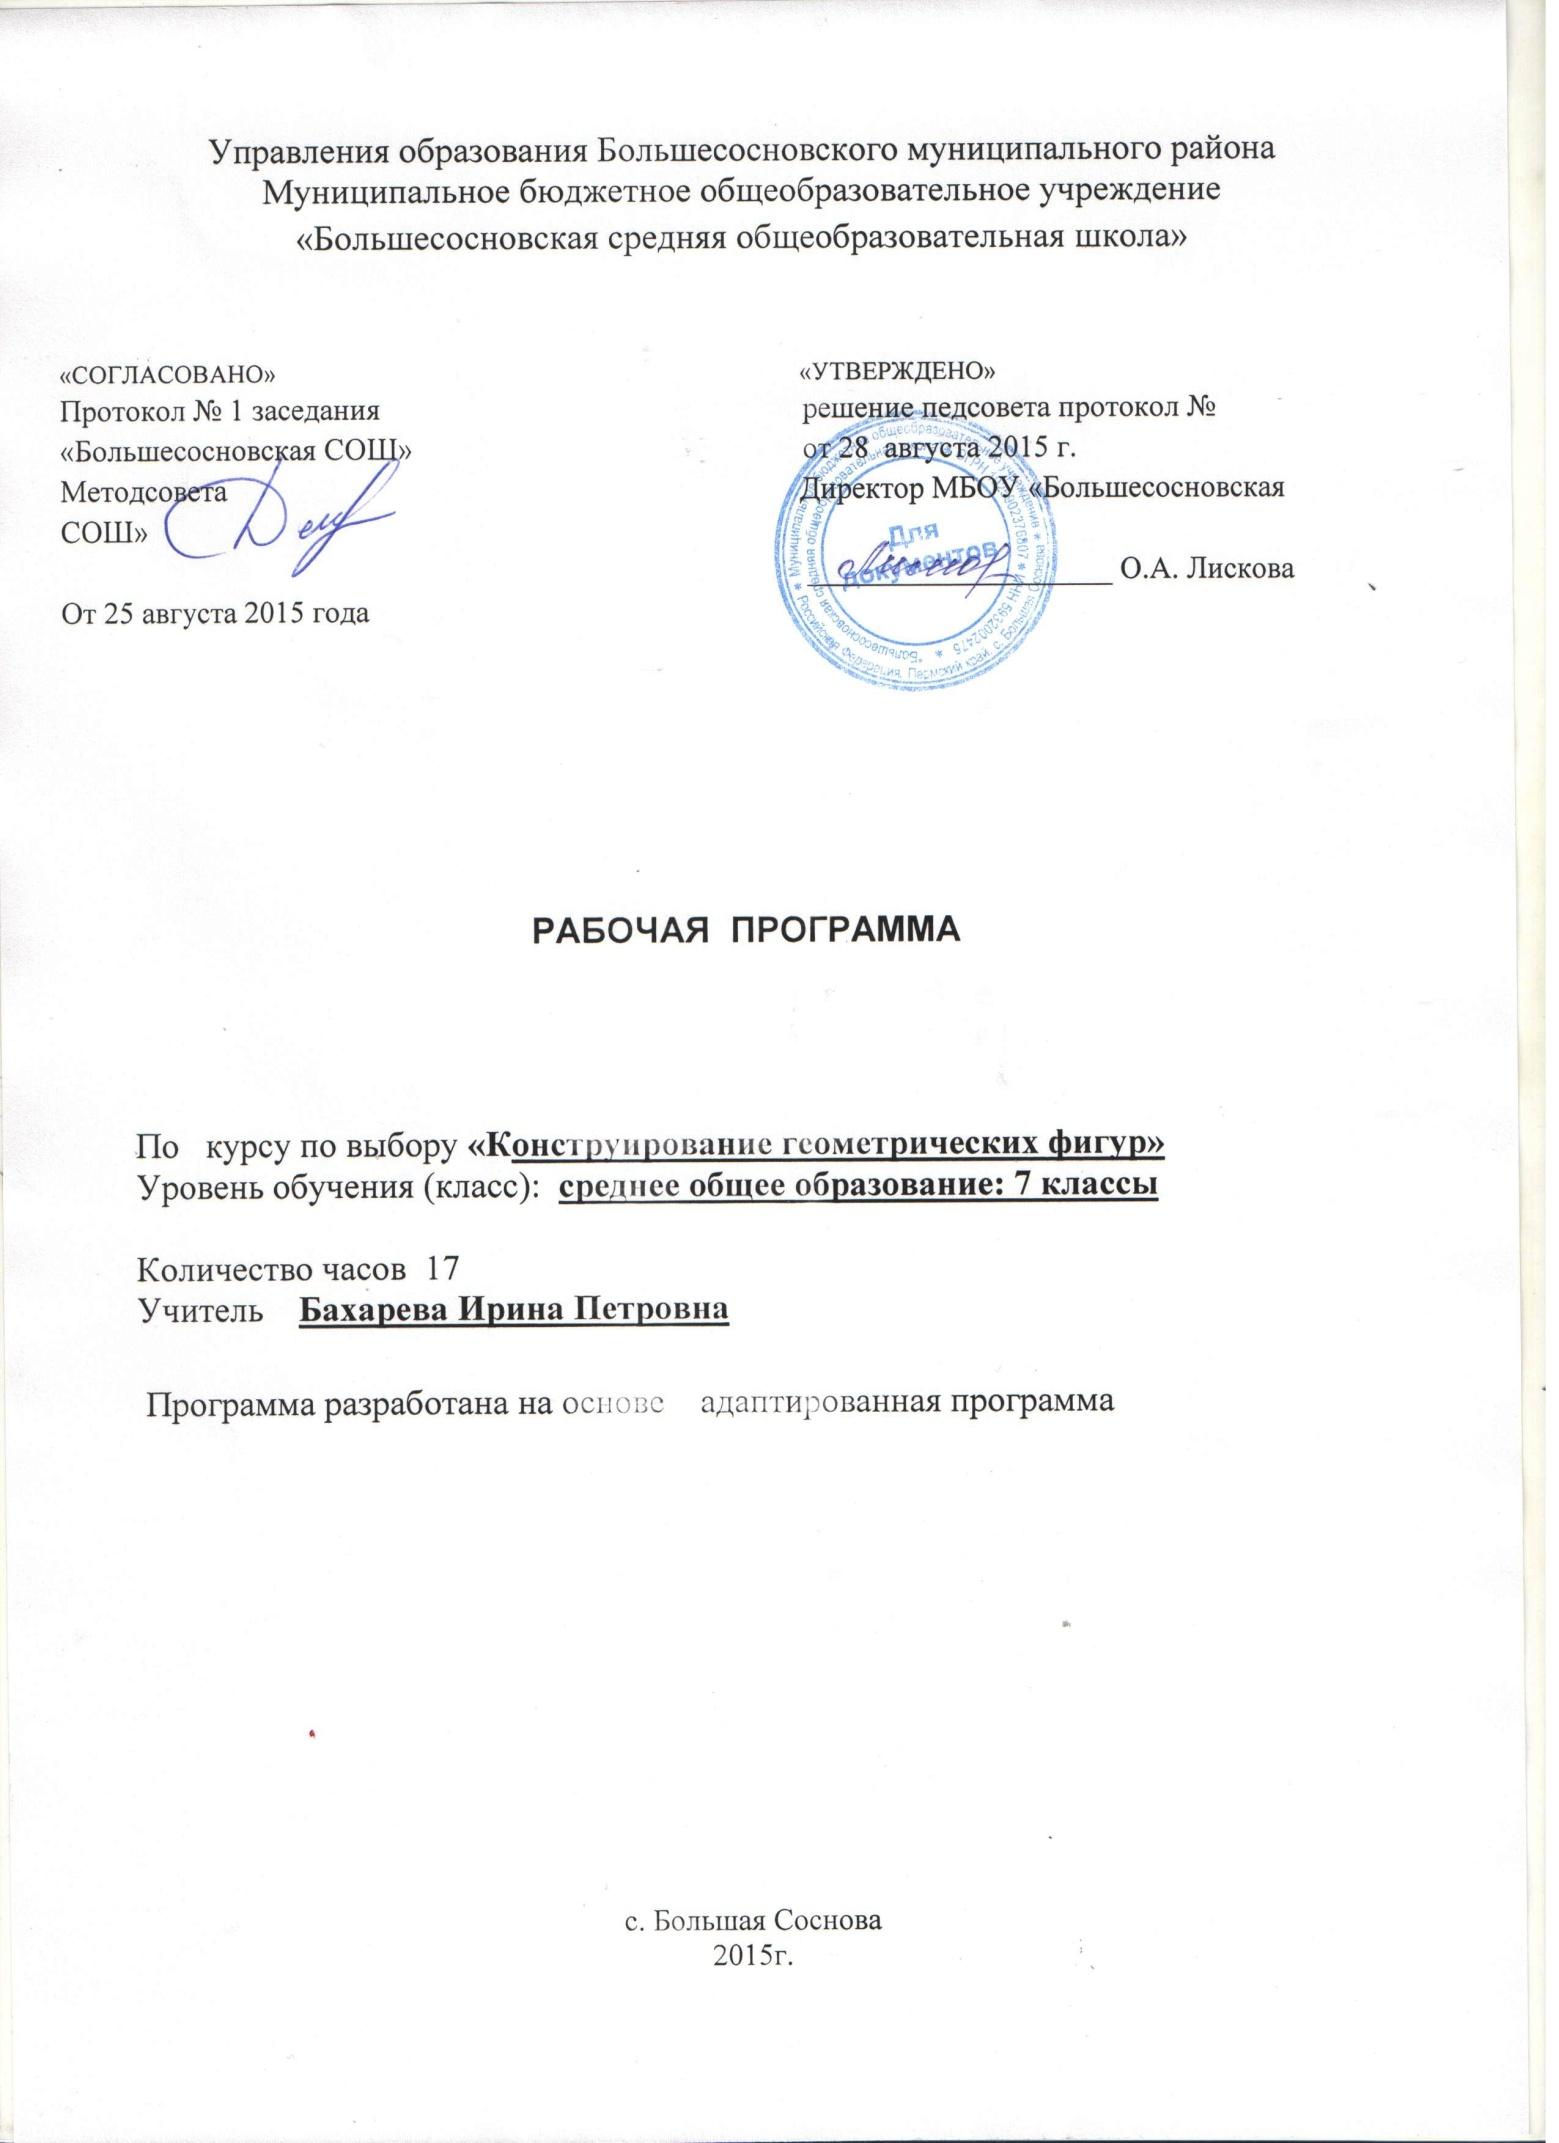 C:\Documents and Settings\Ирина\Рабочий стол\1 001.jpg